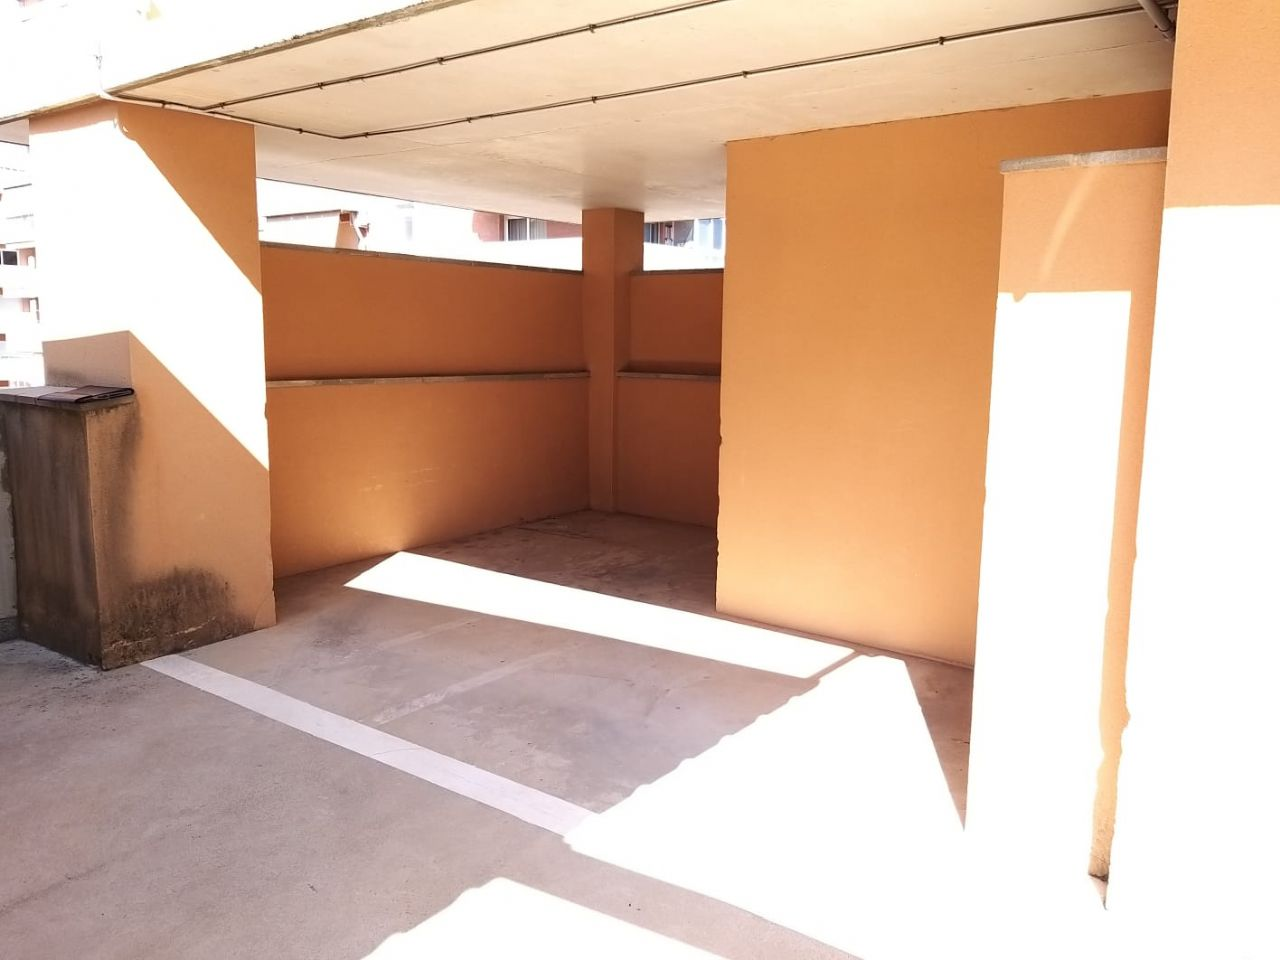 Garaje / Parking en Tarragona, MACIA MALLOL I BOSCH, venta